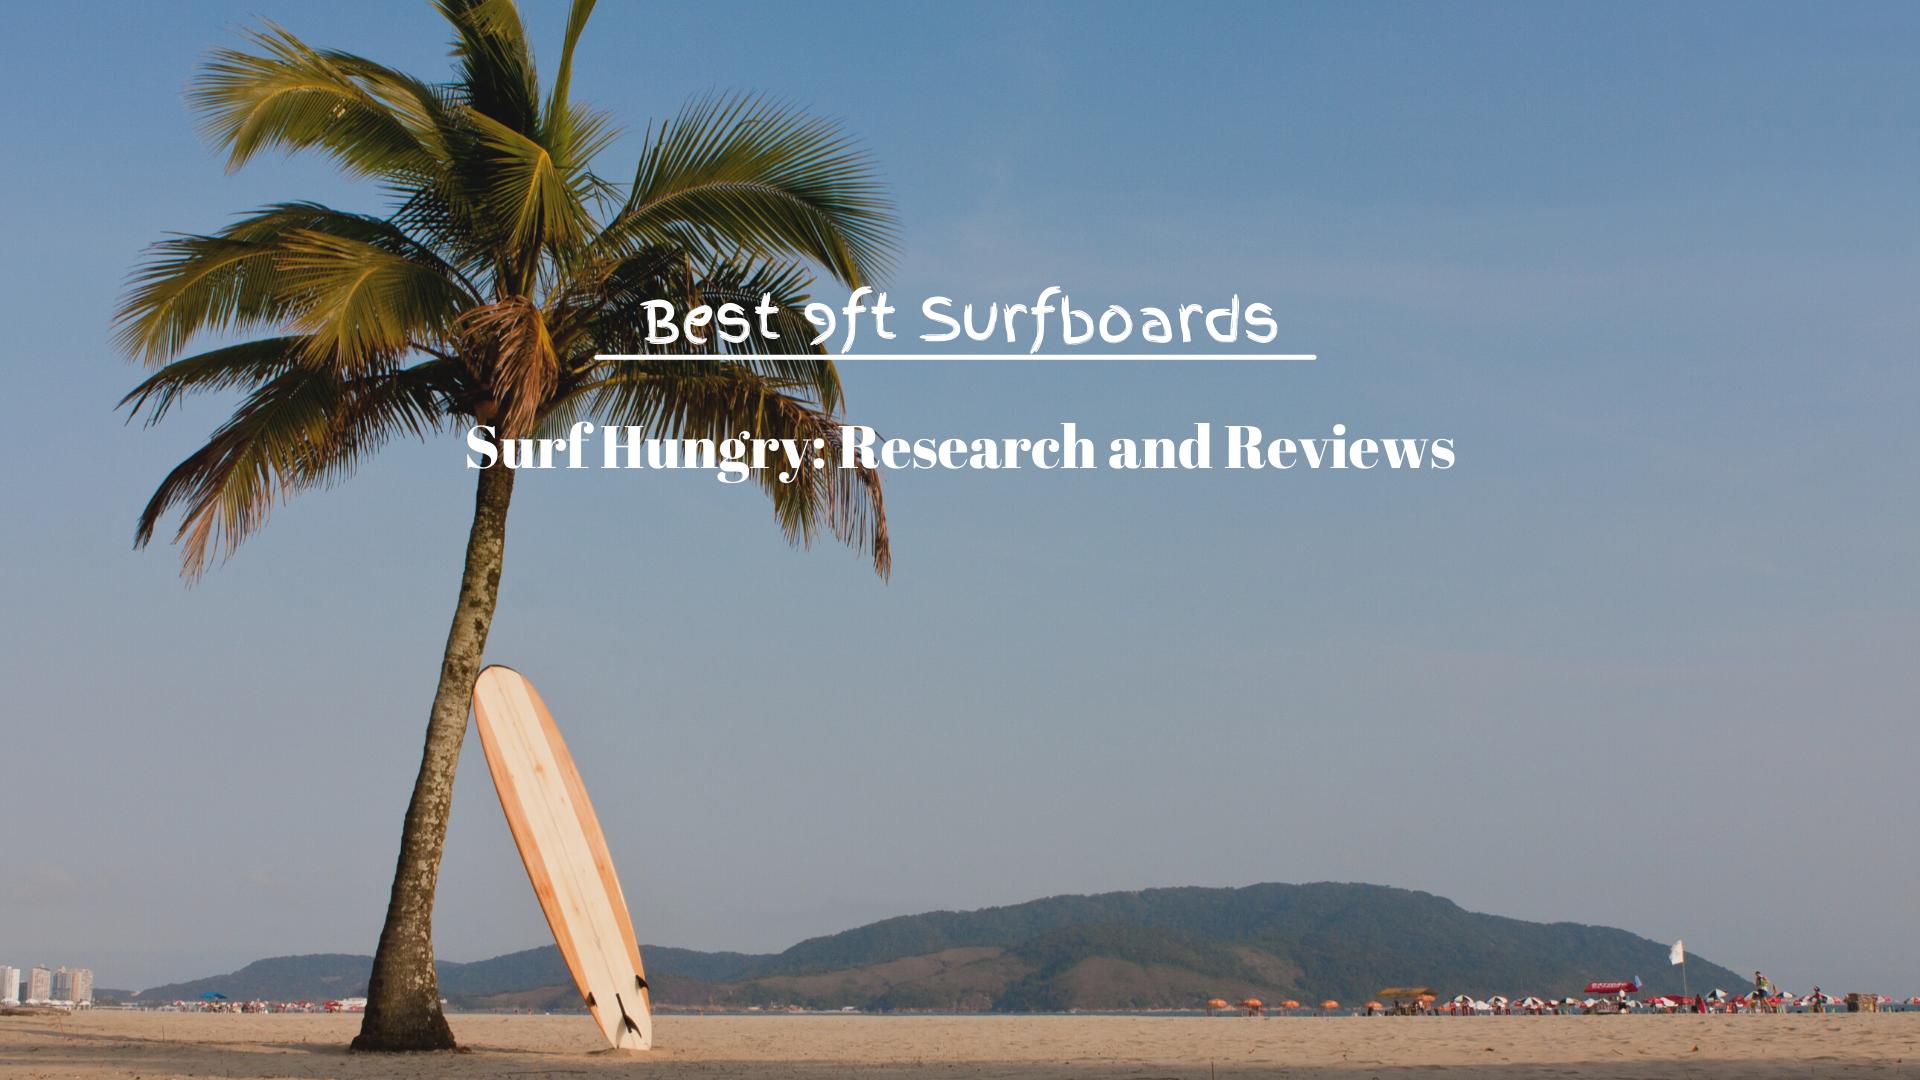 Best 9ft Surfboards